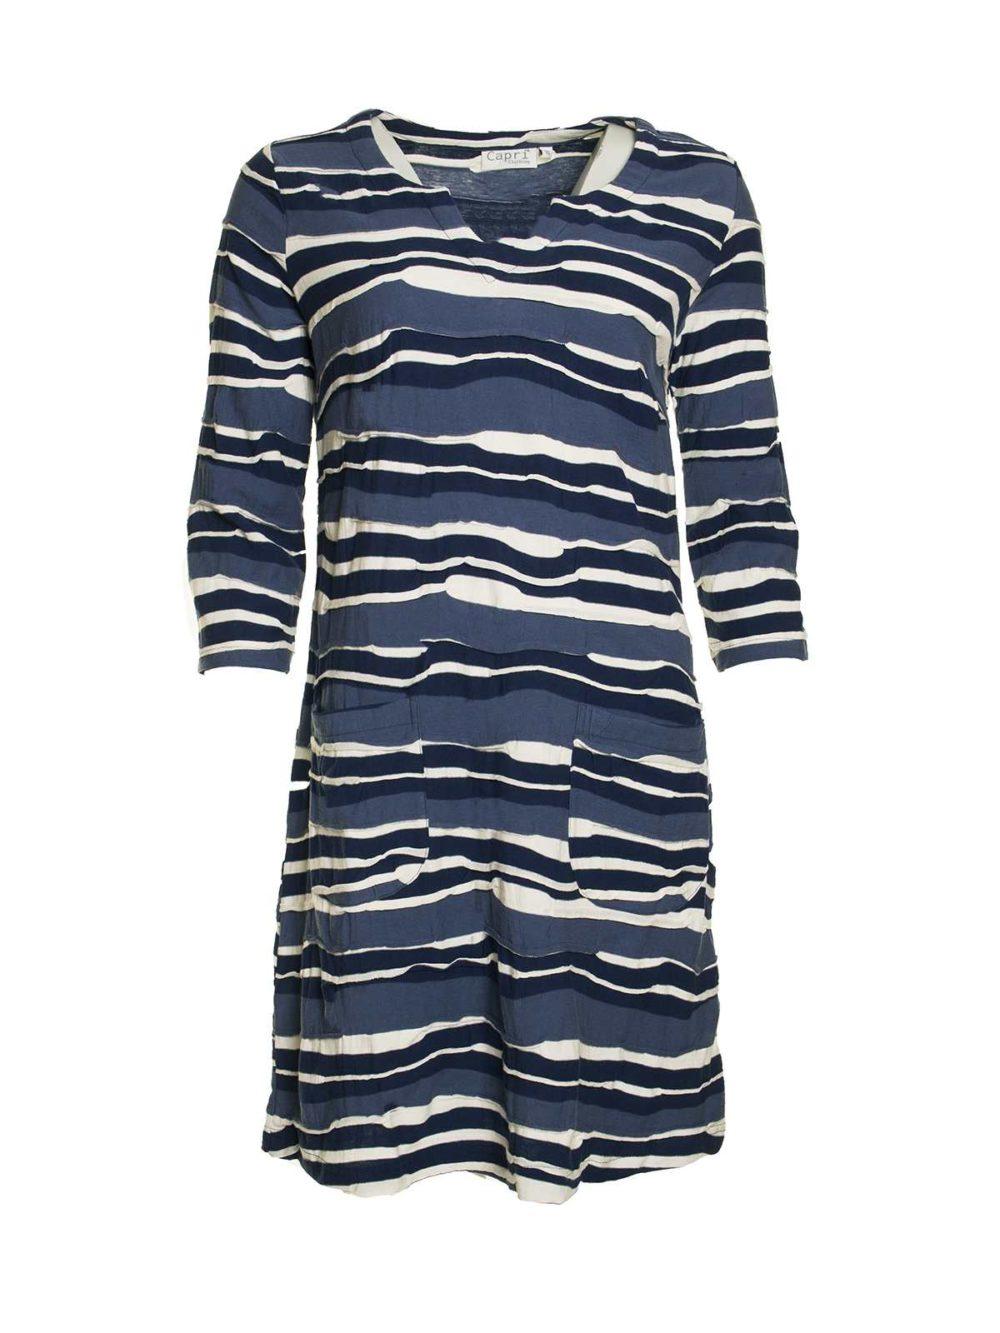 Top RPL-1502 Capri Katie Kerr Women's Clothing